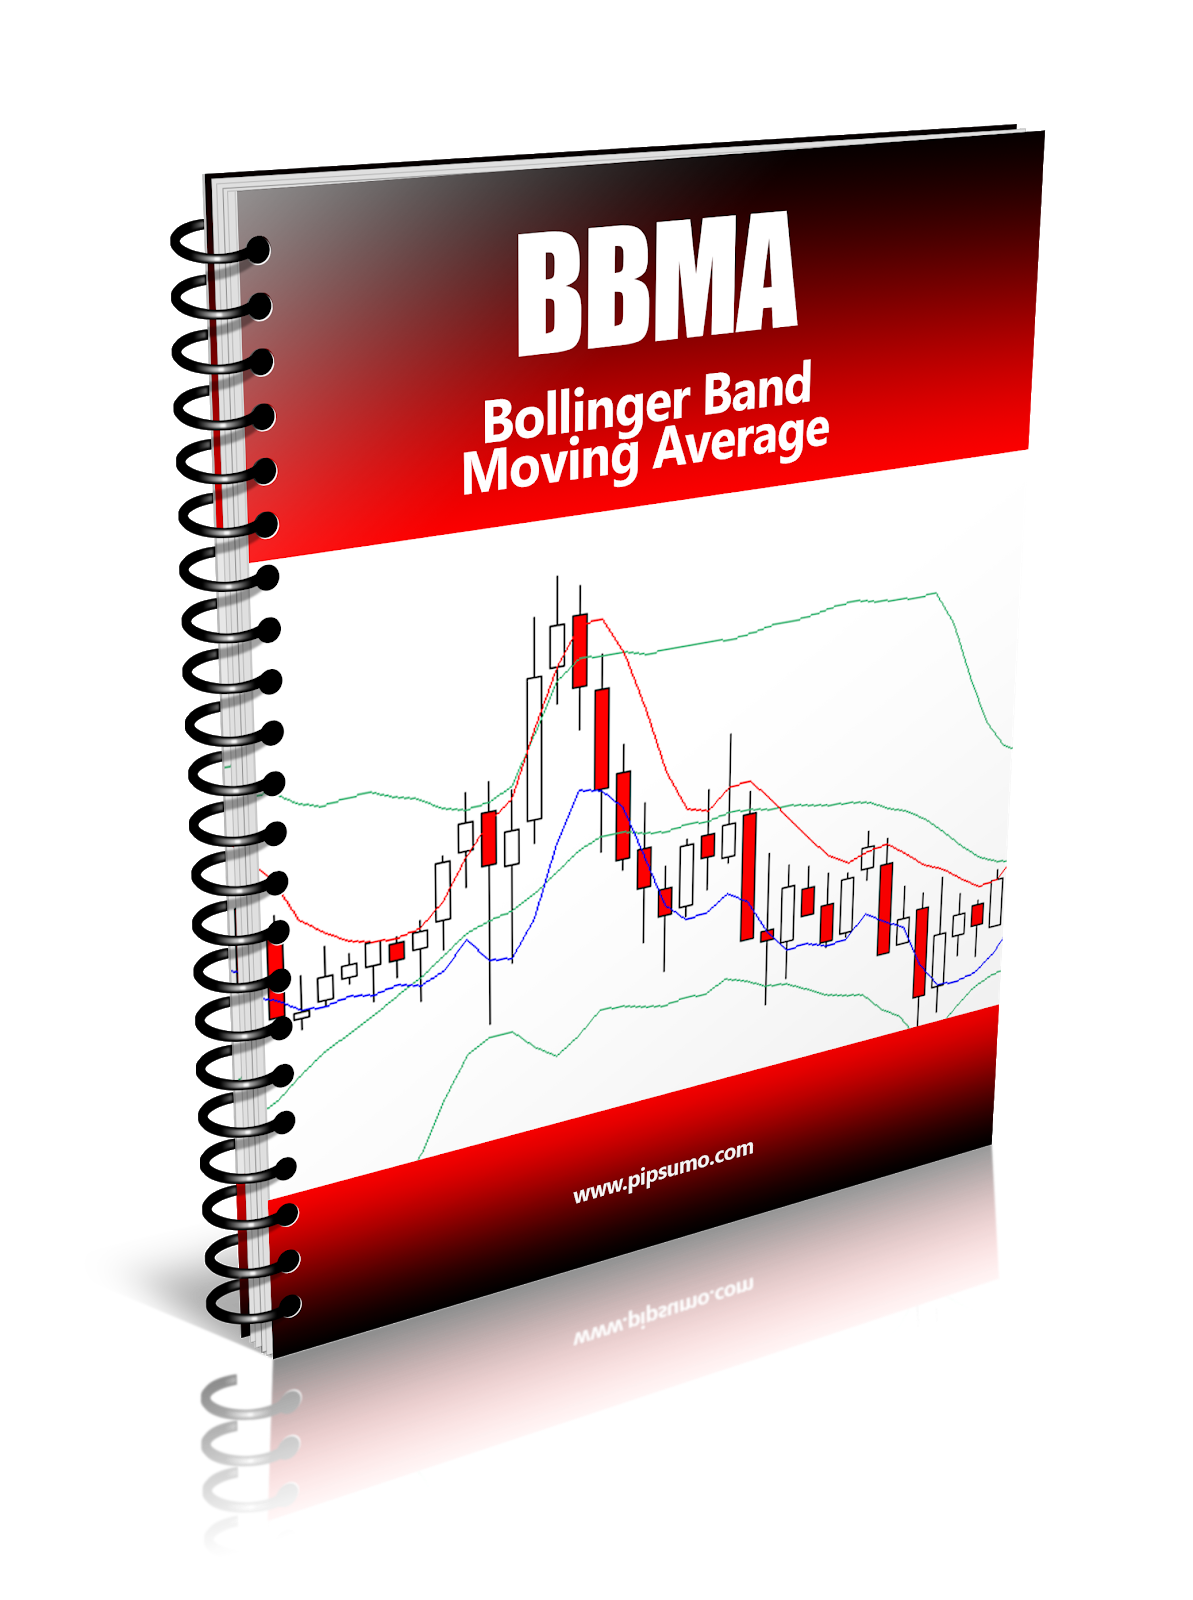 Bbma forex indicator